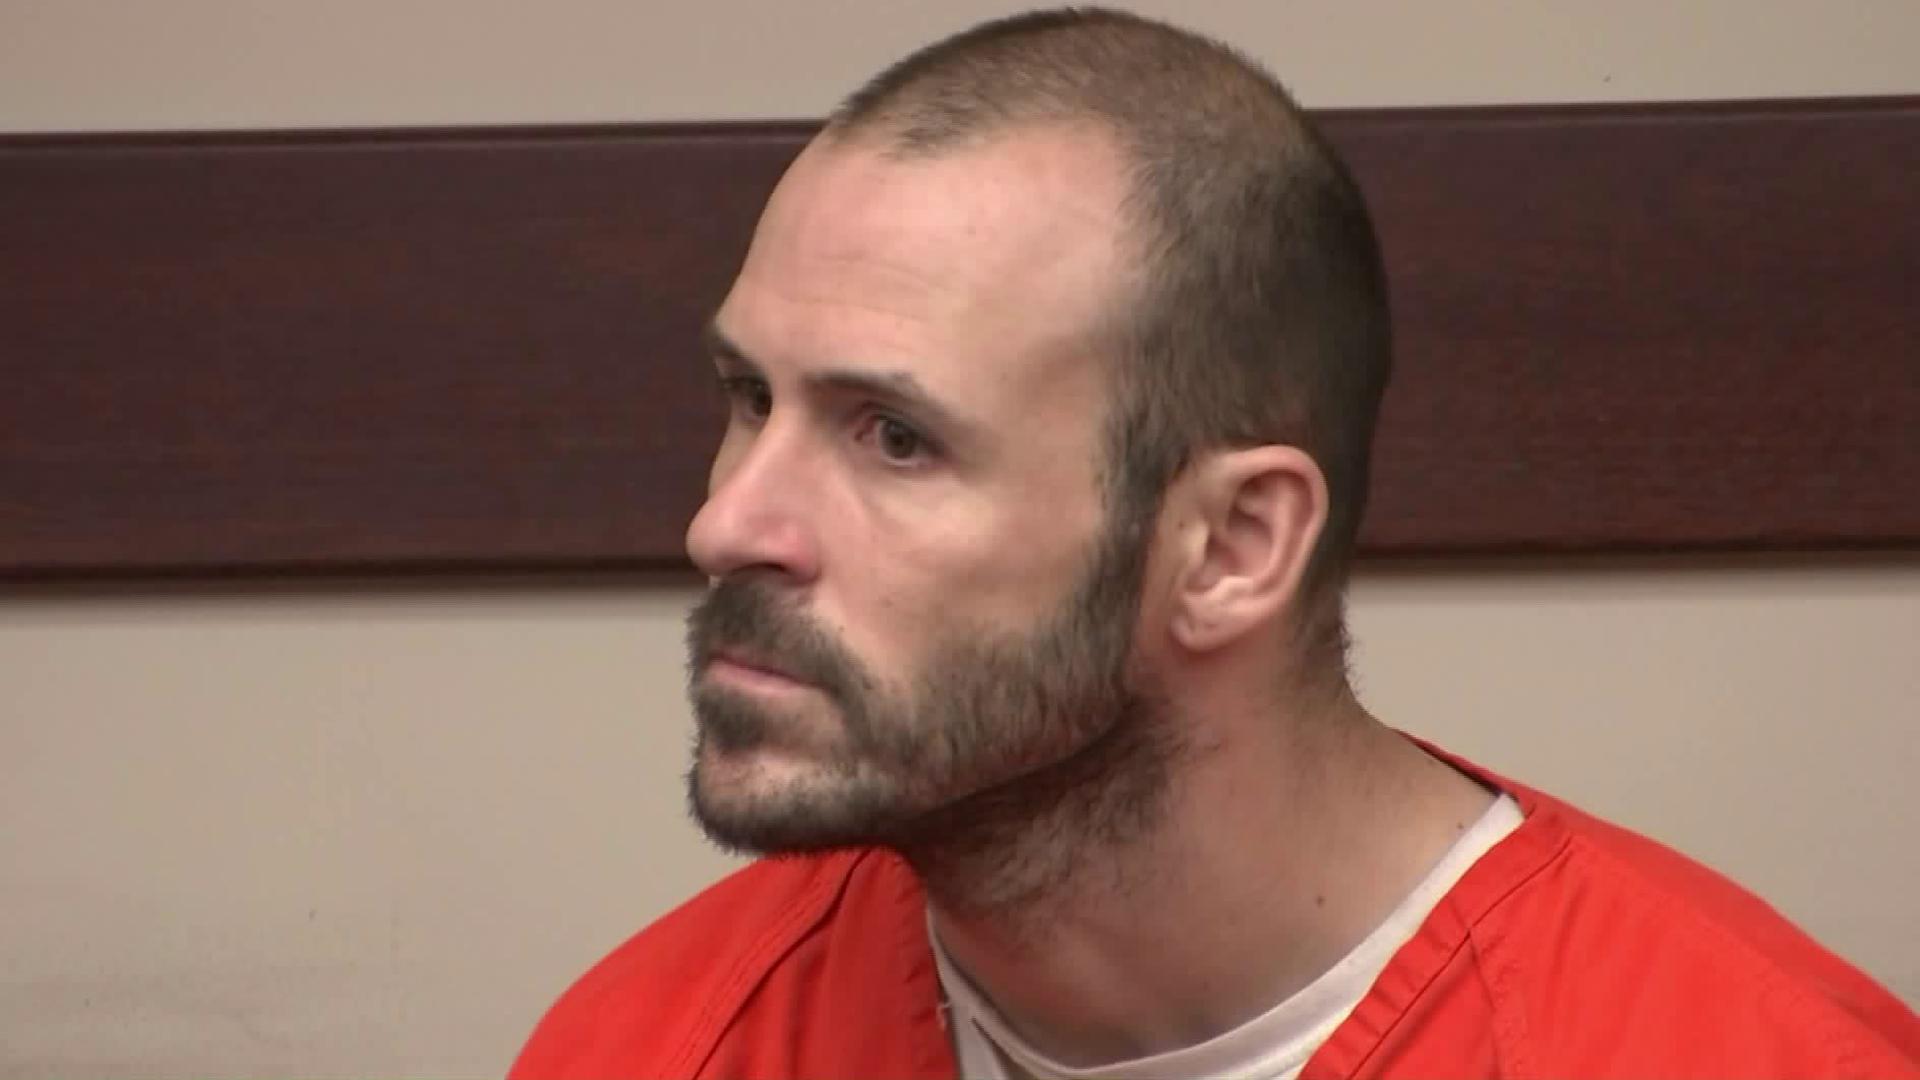 Bryce McIntosh appears in court on April 3, 2019. (Credit: KTLA)